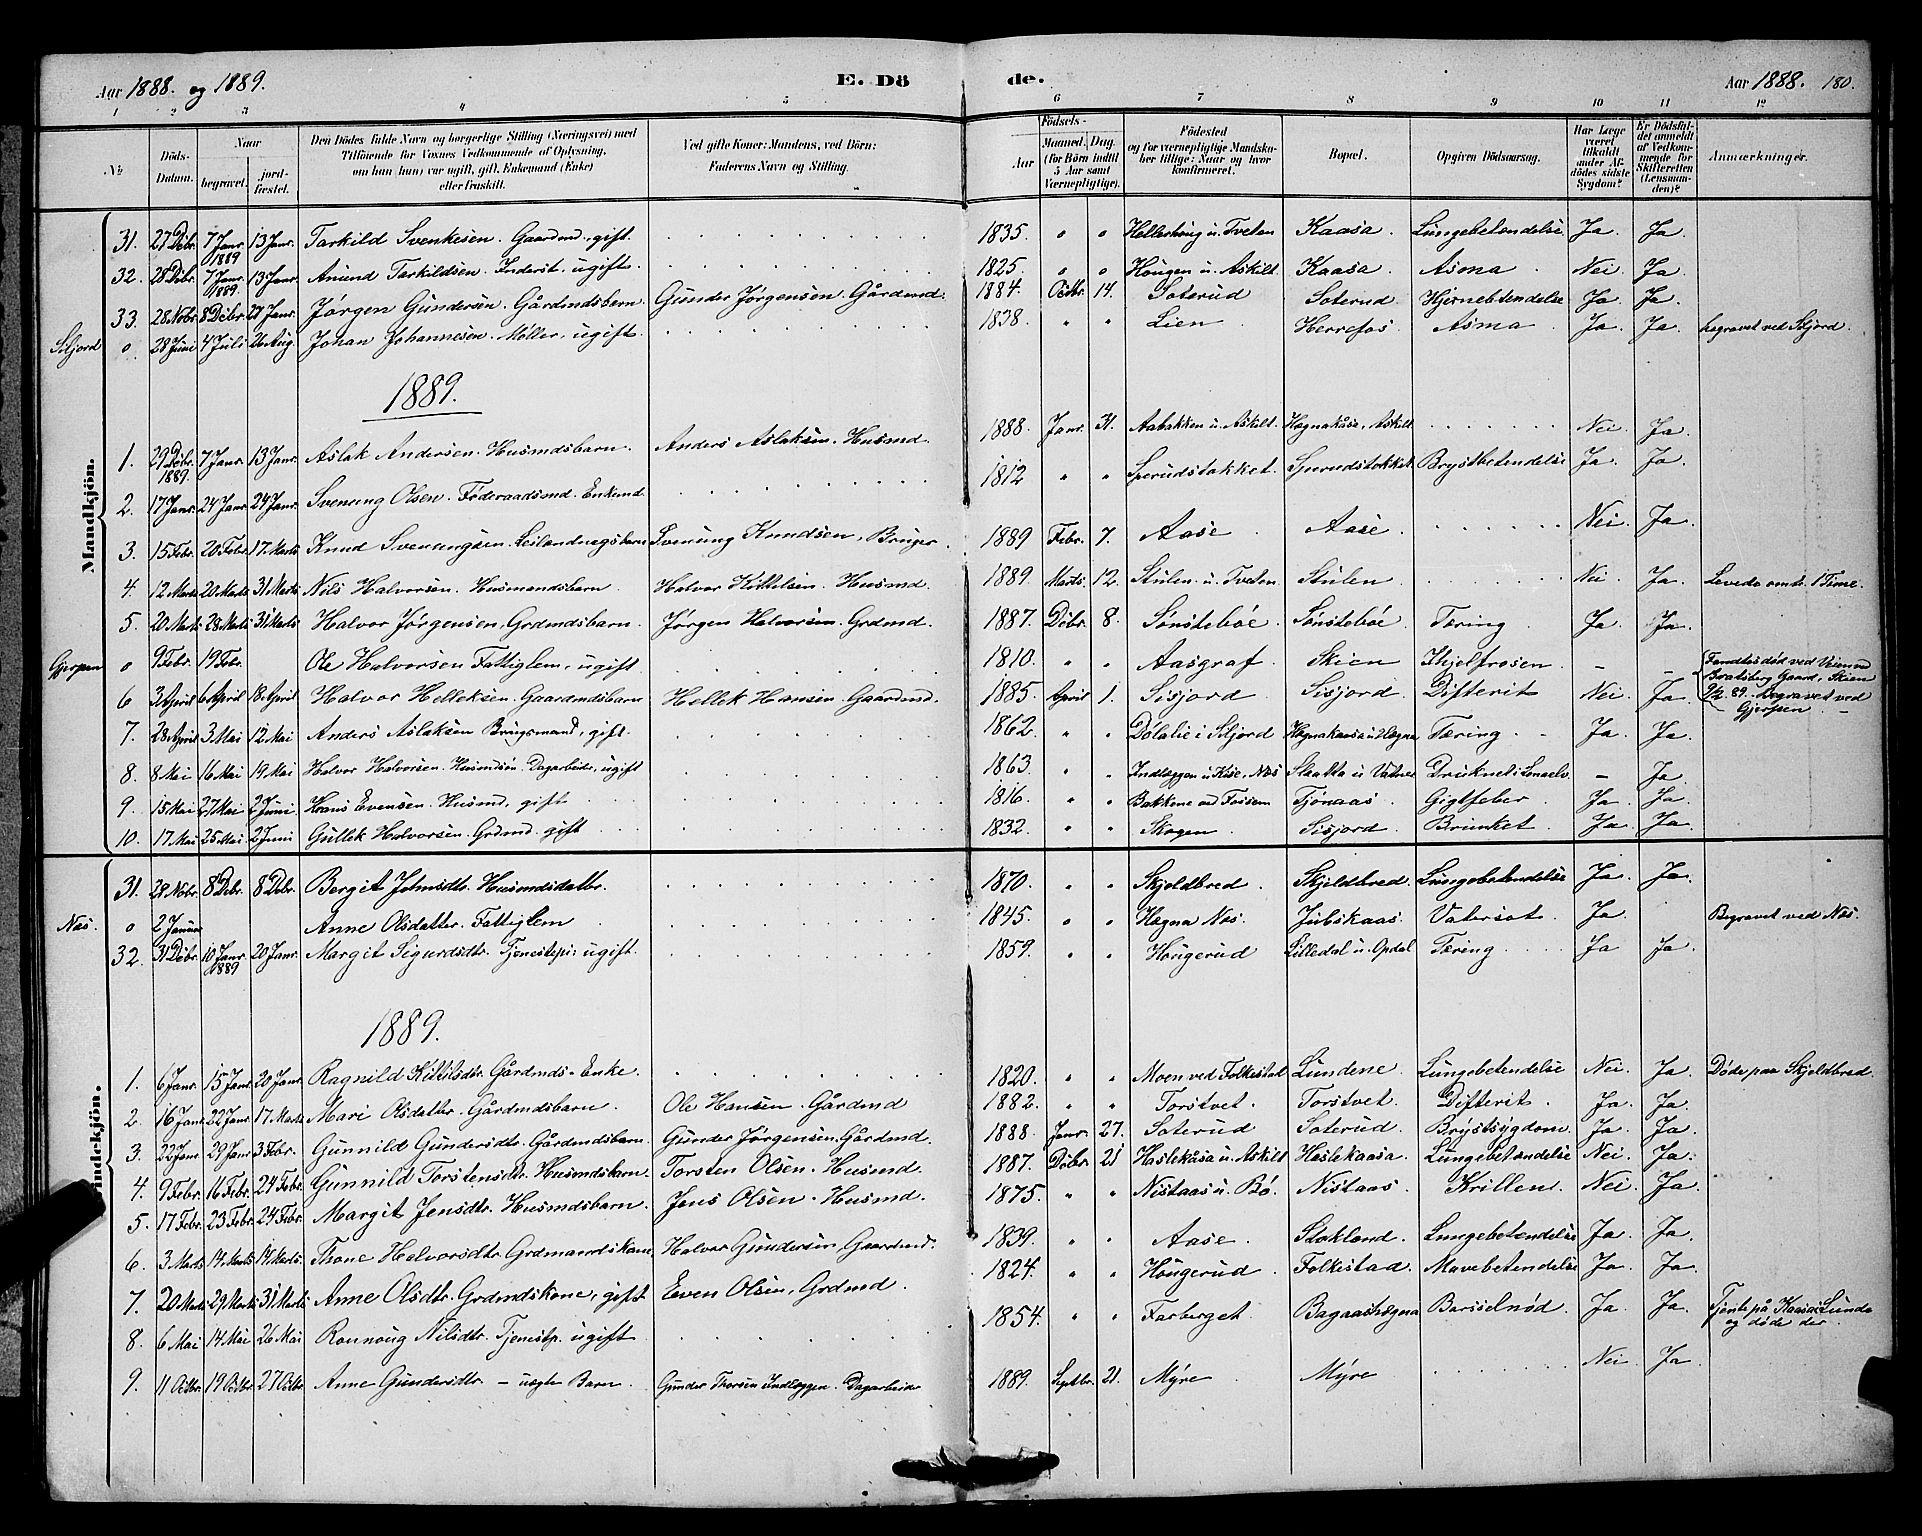 SAKO, Bø kirkebøker, G/Ga/L0005: Klokkerbok nr. 5, 1883-1897, s. 180